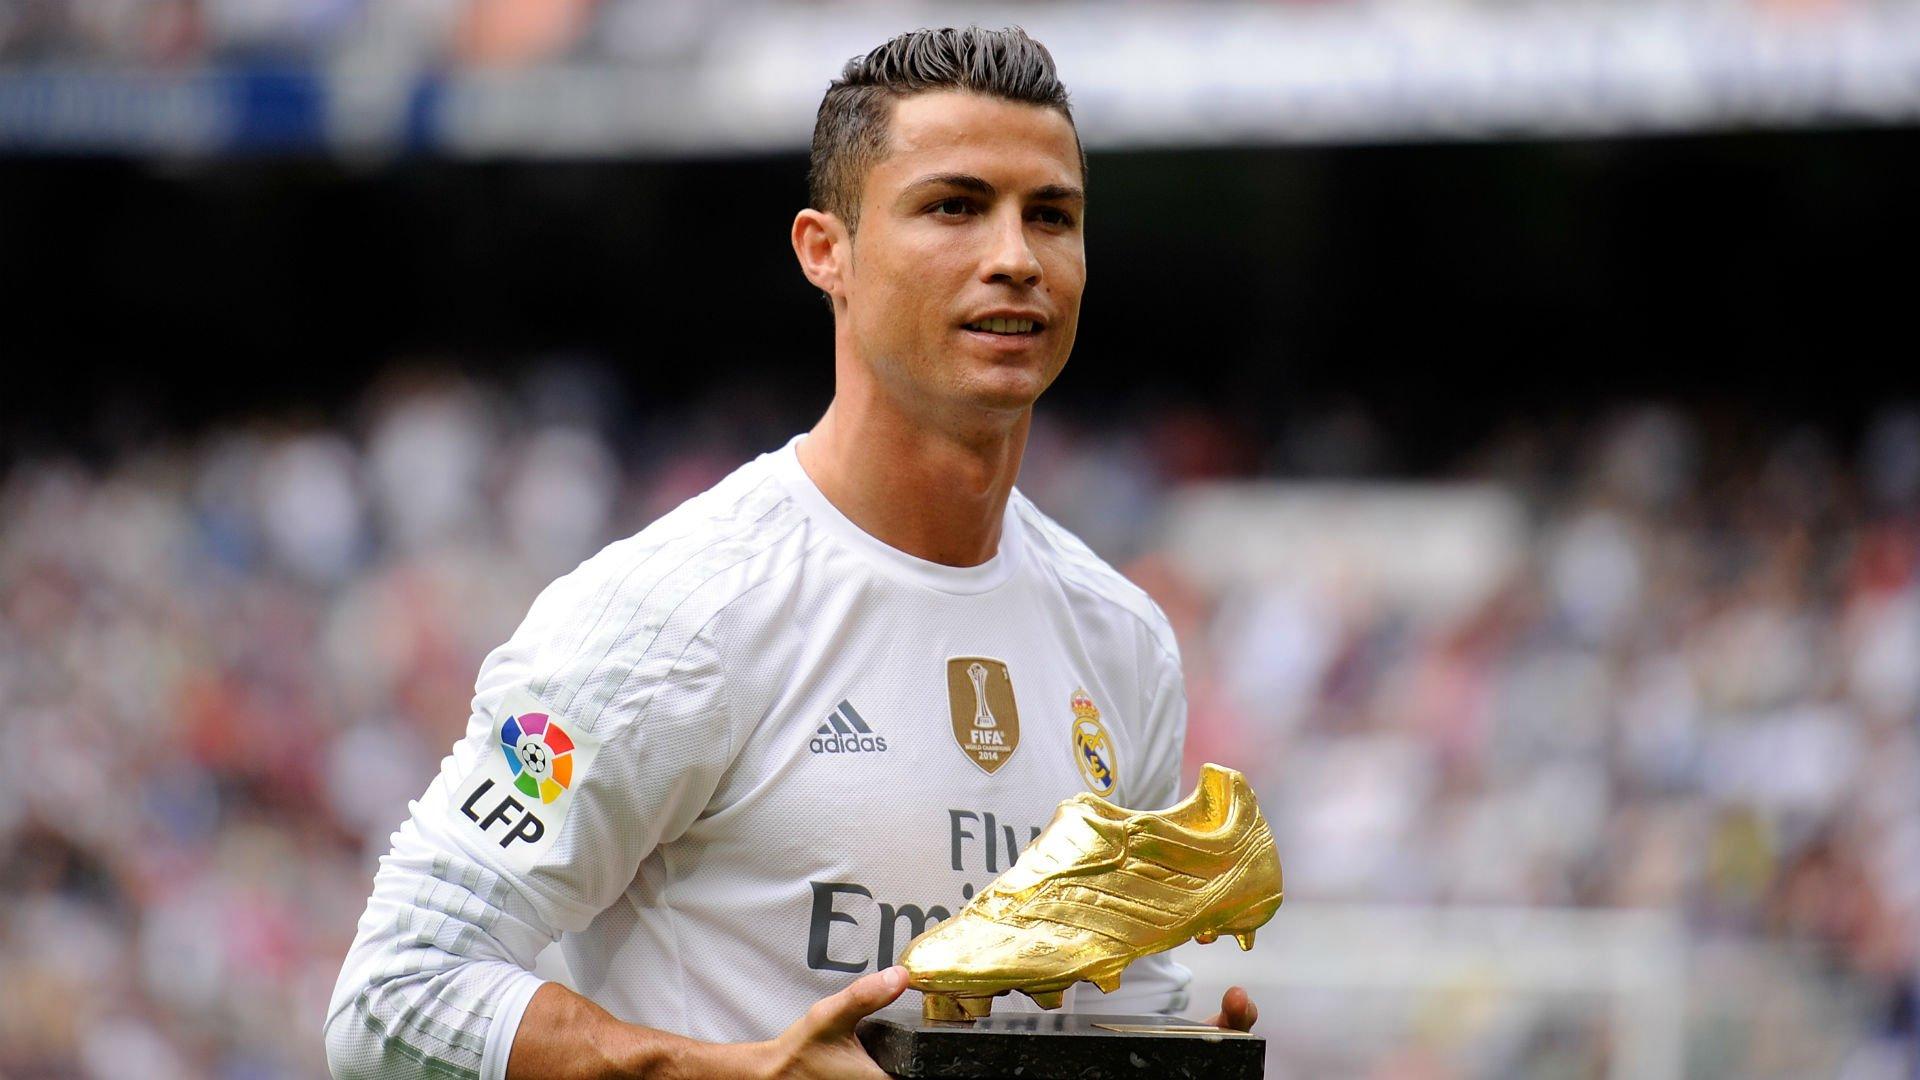 Роналду повторил рекорд Пеле, забив 7 голов начемпионатах мира